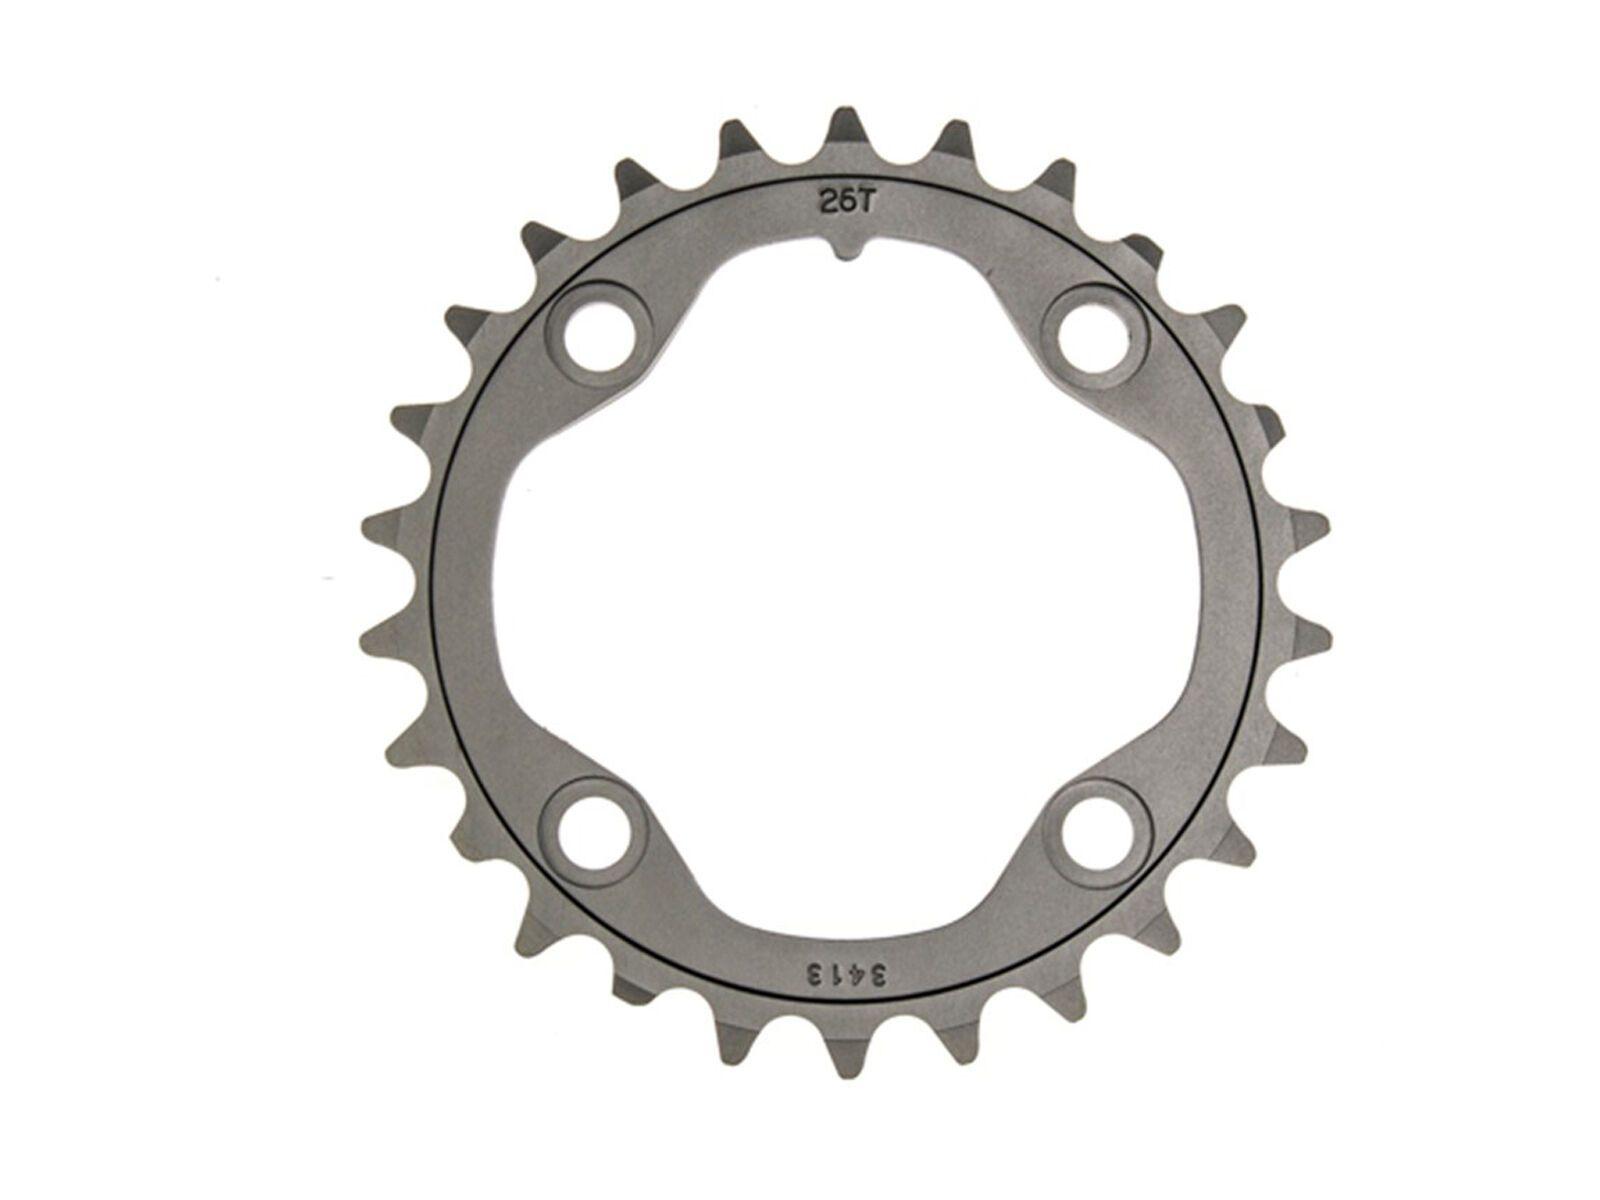 SRAM XX Kettenblatt - 2x10, grau, Größe 39 Z // LK 120 // Cannondale C-Pin 400060117